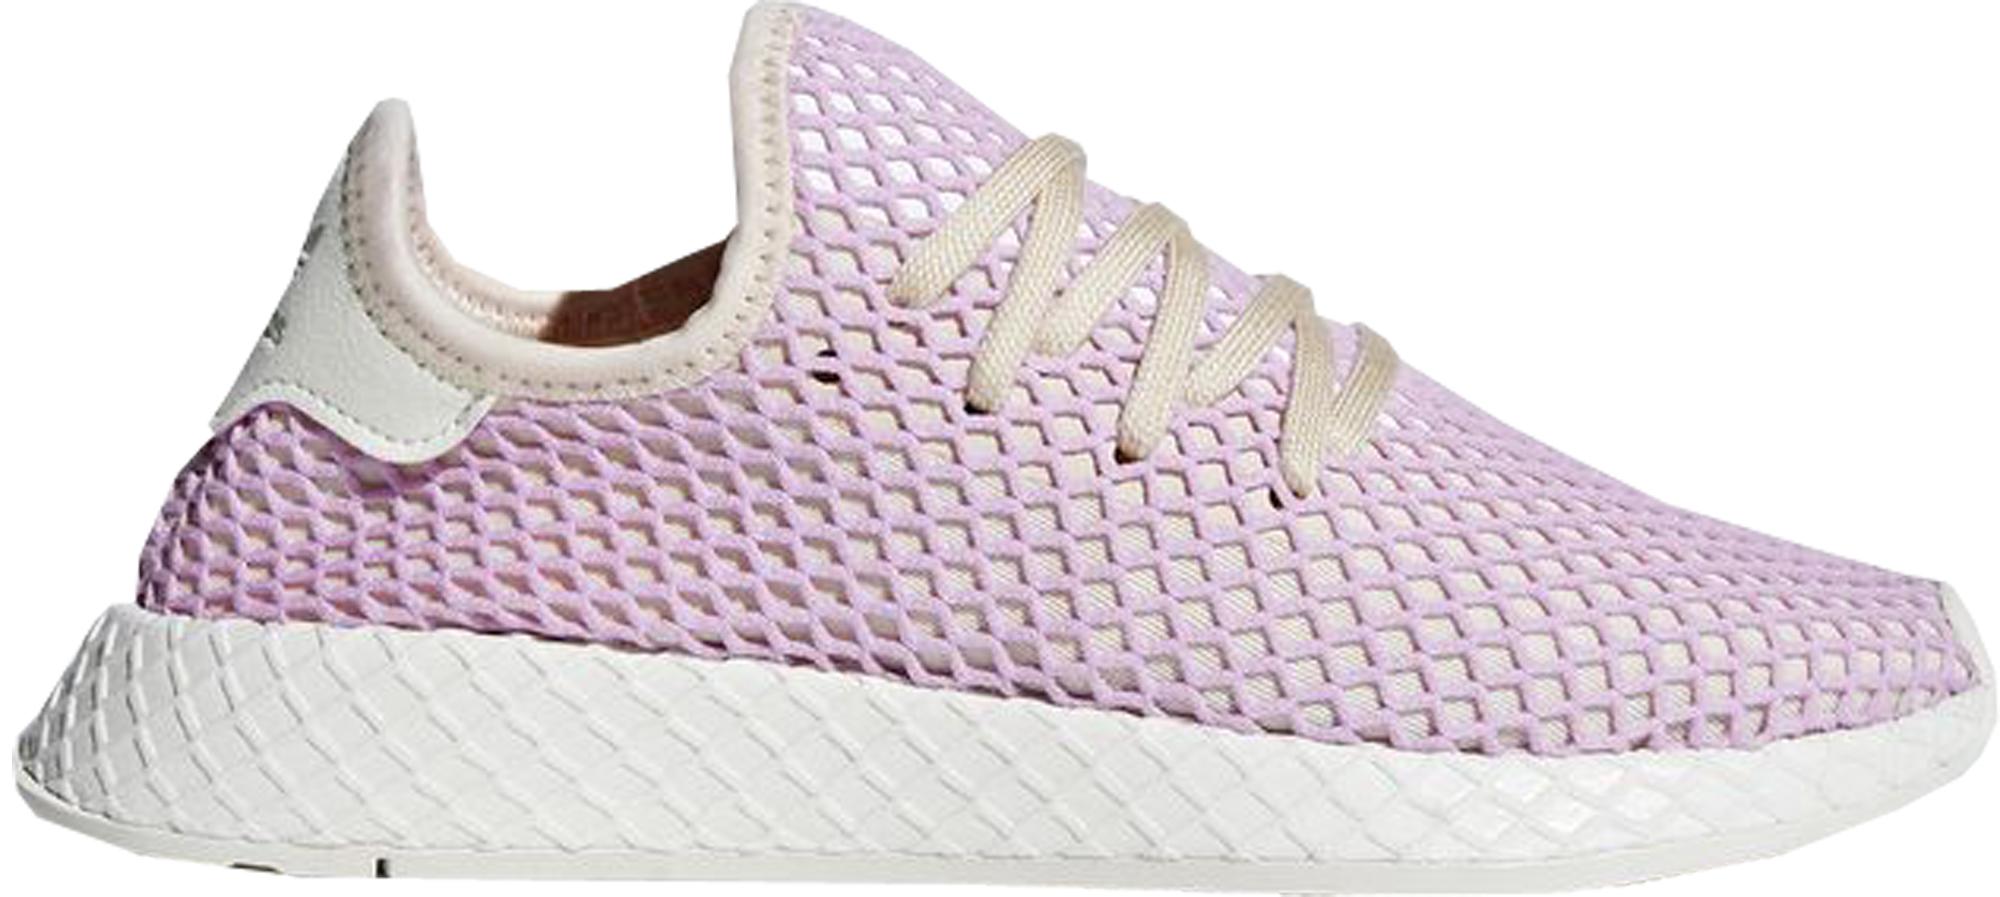 adidas Deerupt Clear Lilac (W)